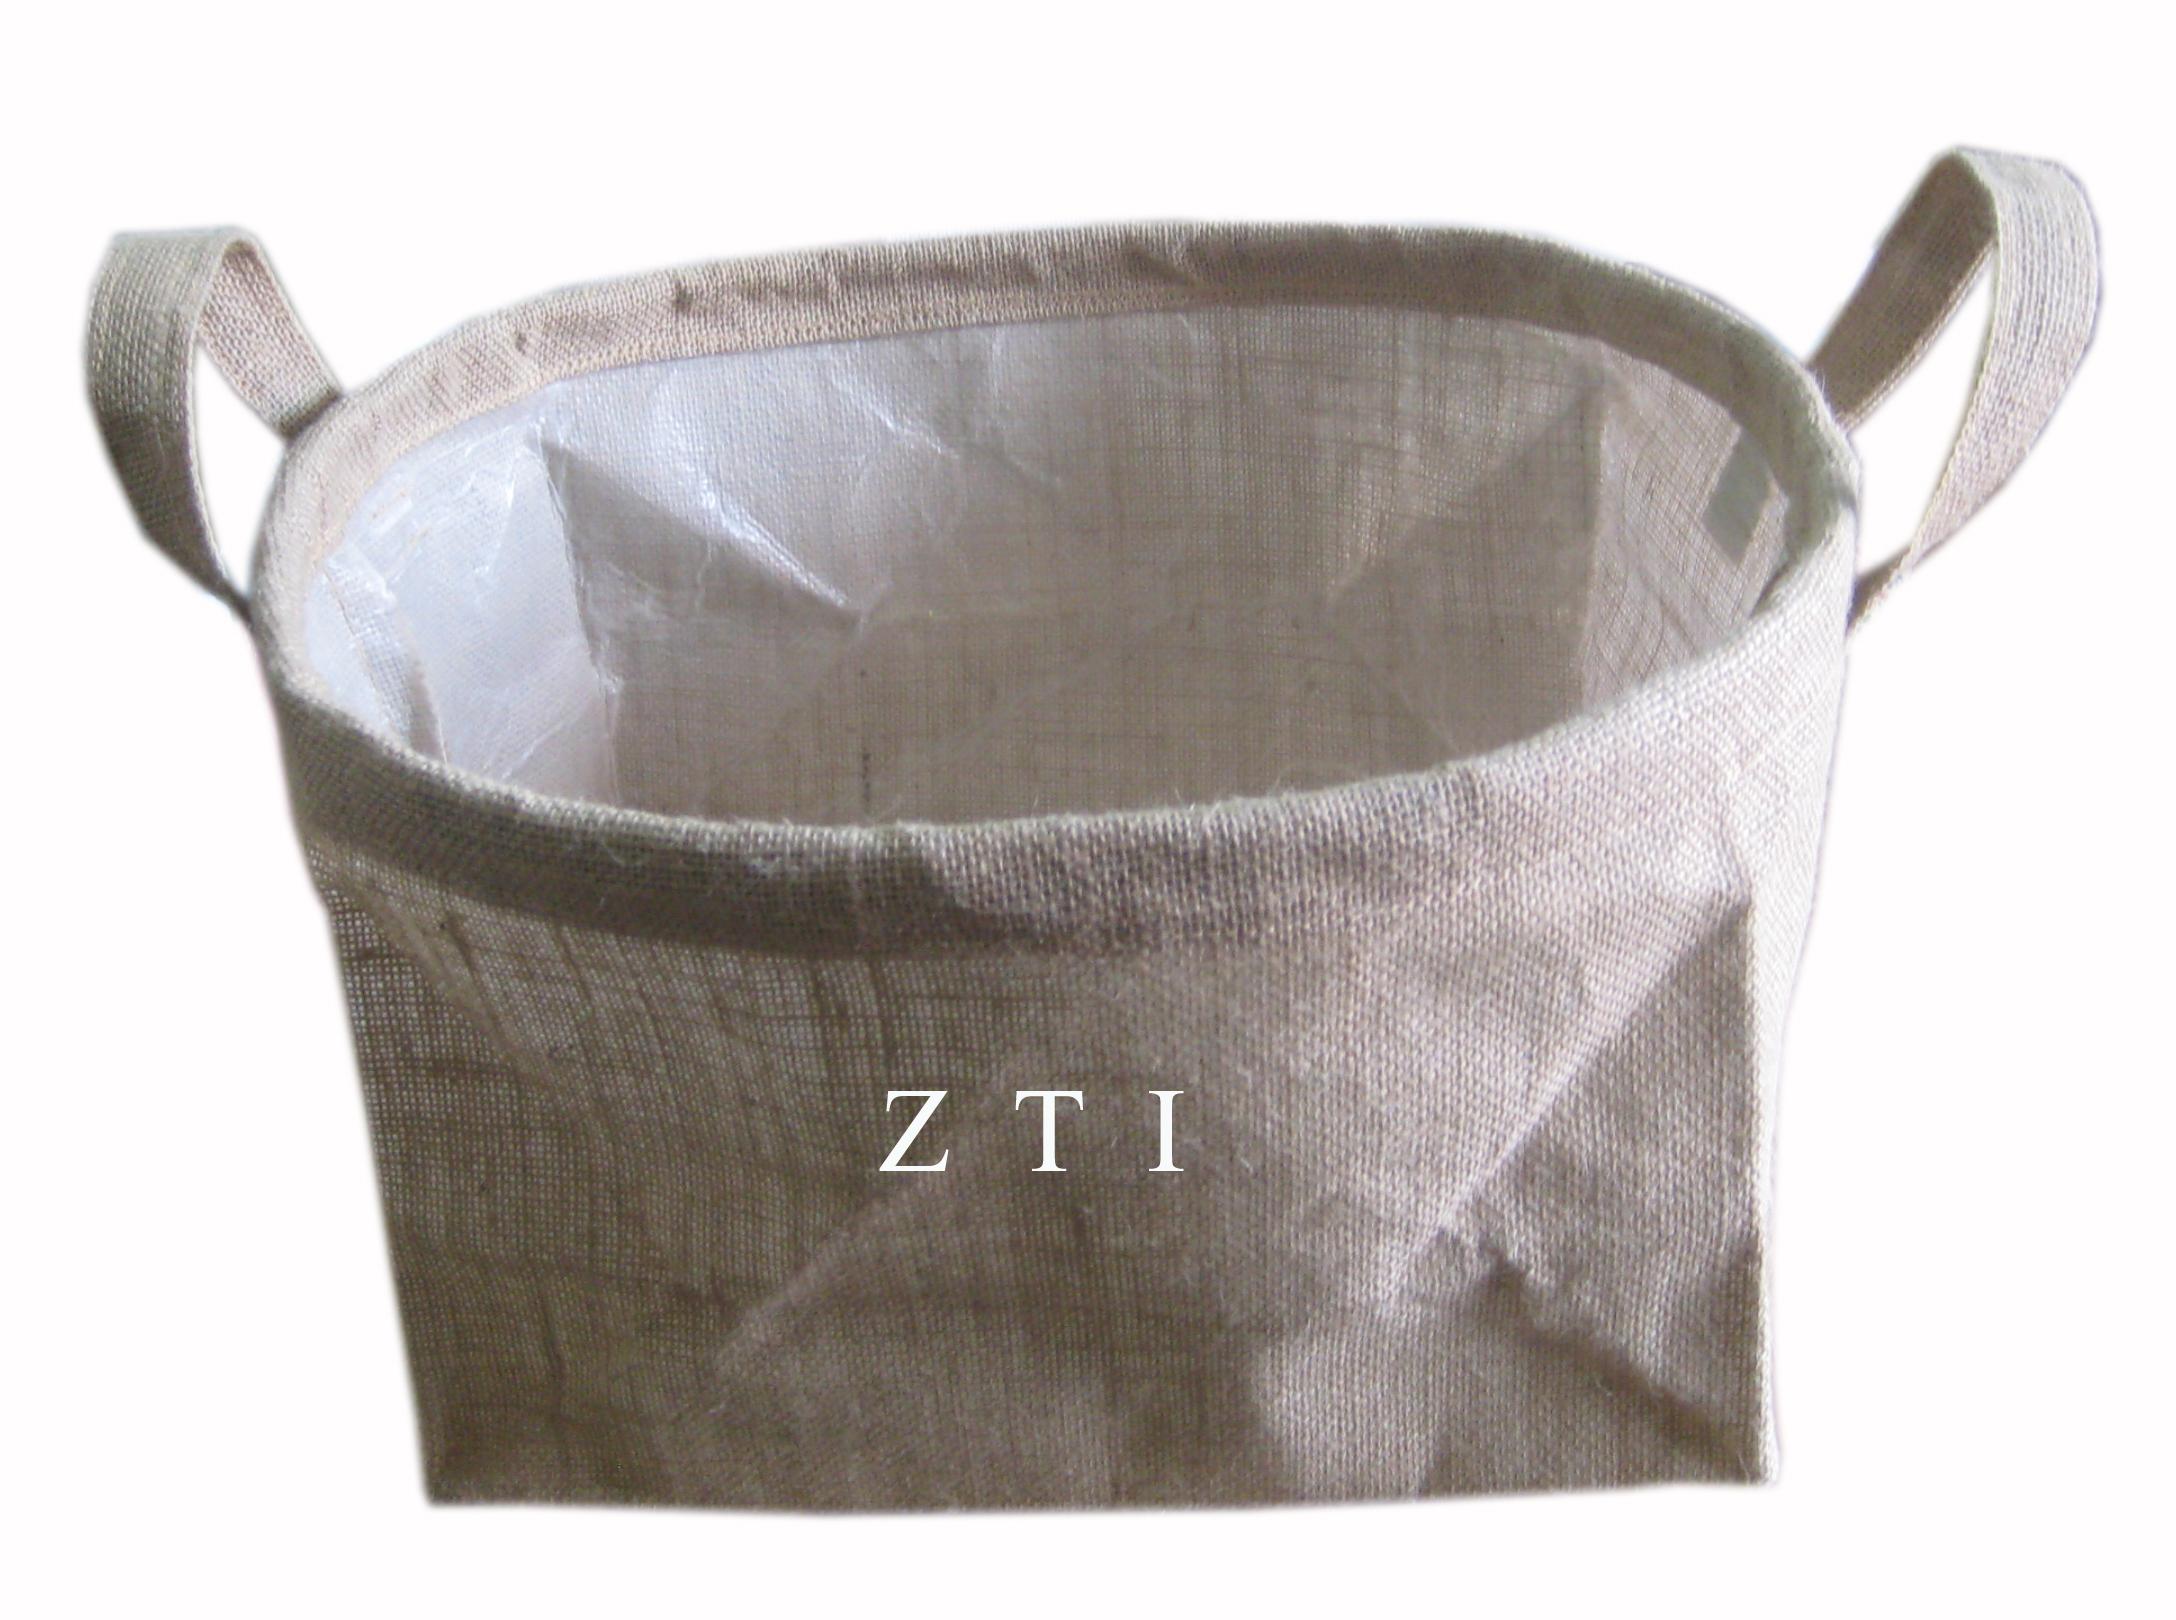 MODEL-NO.-JUS-1276-SIZE-30x26x20cms.-PRICE-US-1.10